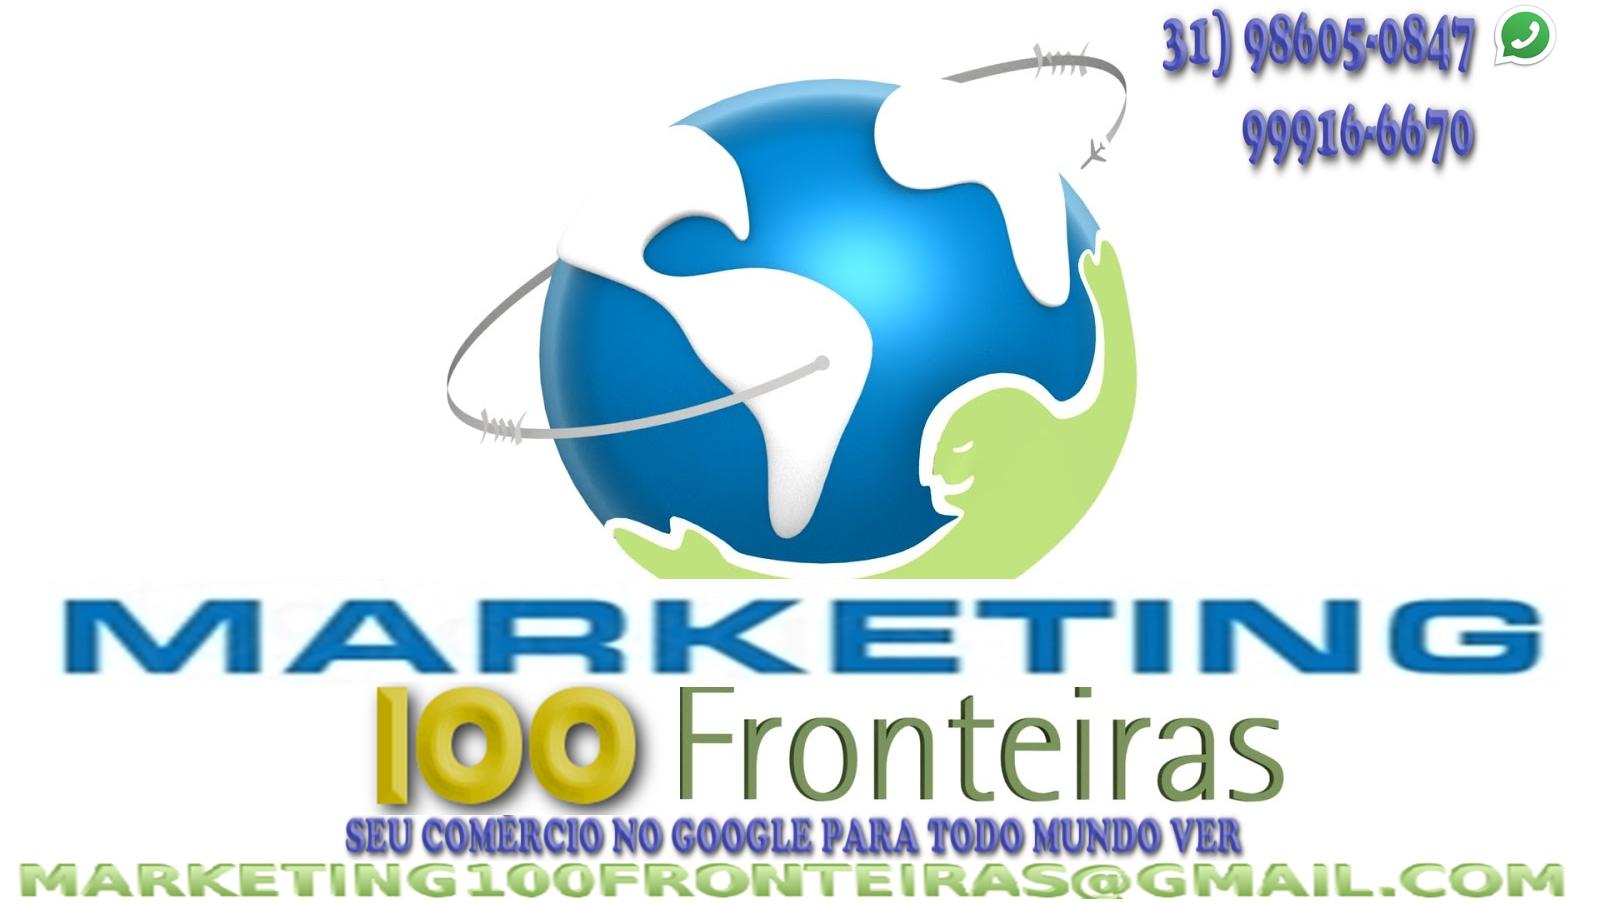 marketing 100 fronteiras